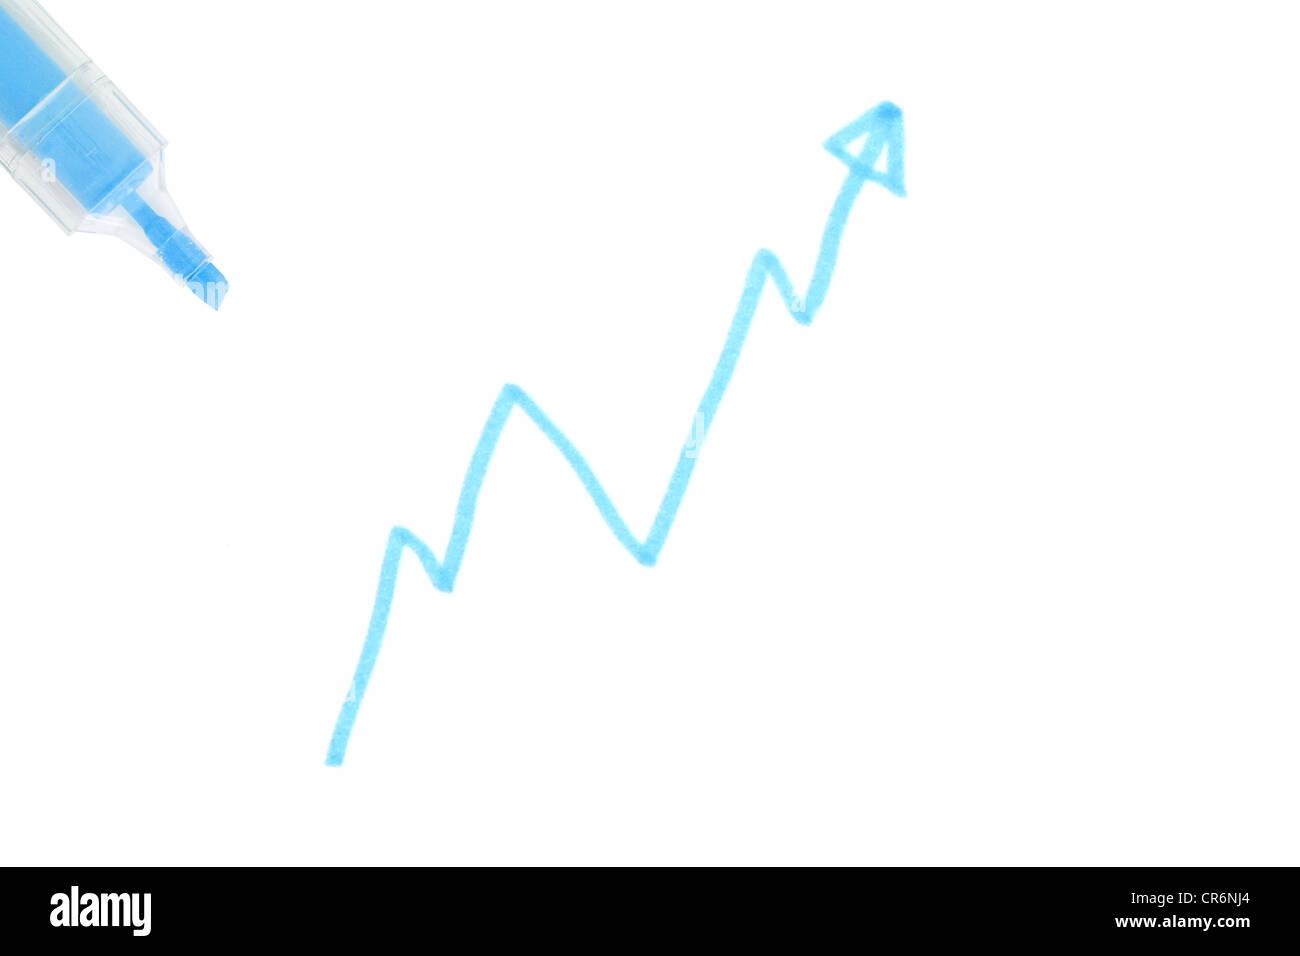 Stock curve - Stock Image